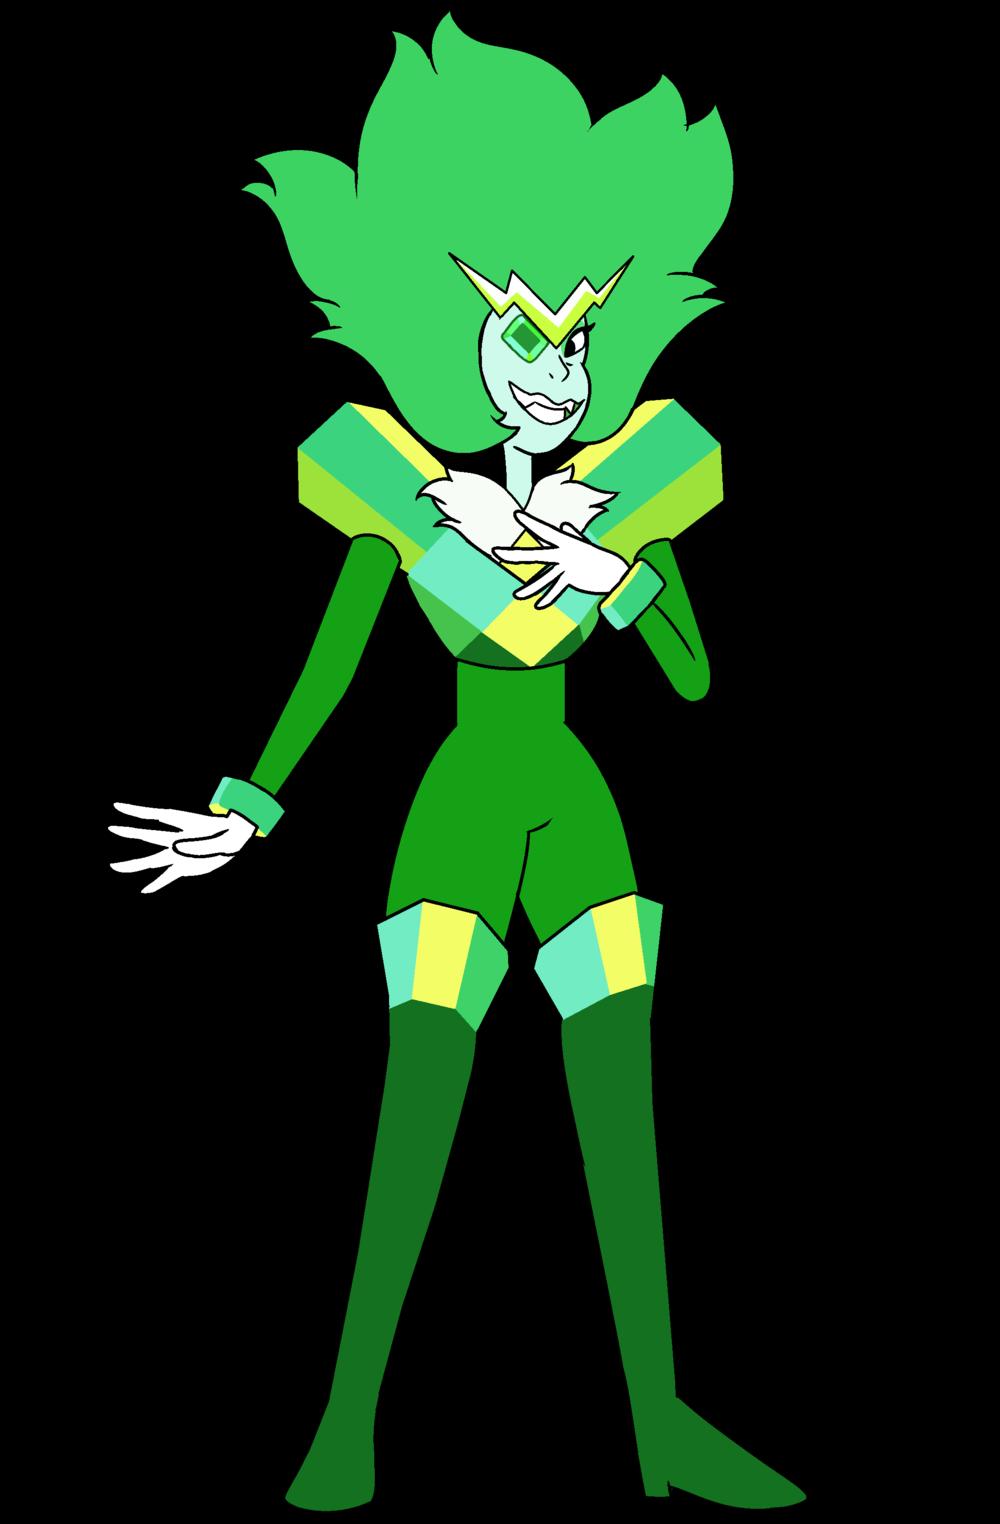 Pants clipart kelly green. Emerald pinterest dark hair